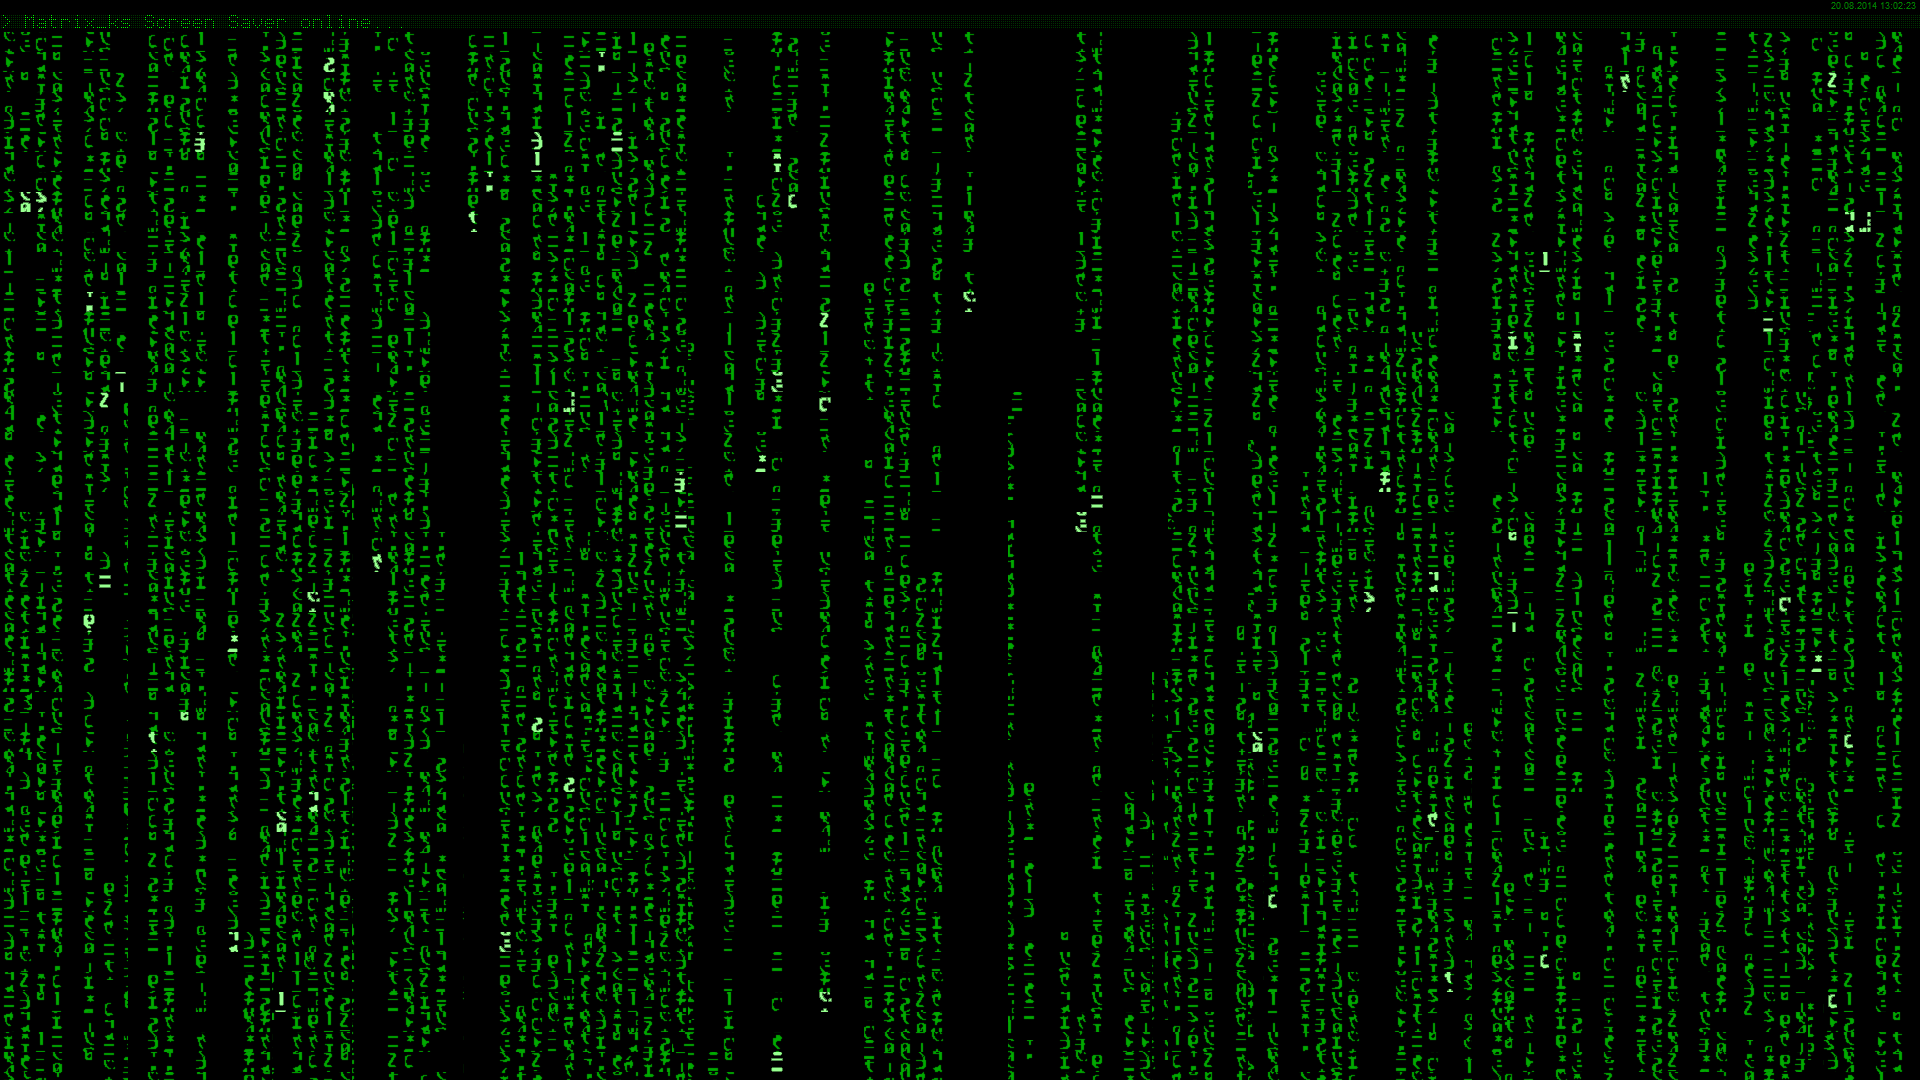 448101 1920x1080 matrix background desktop free PNG 287 kB.